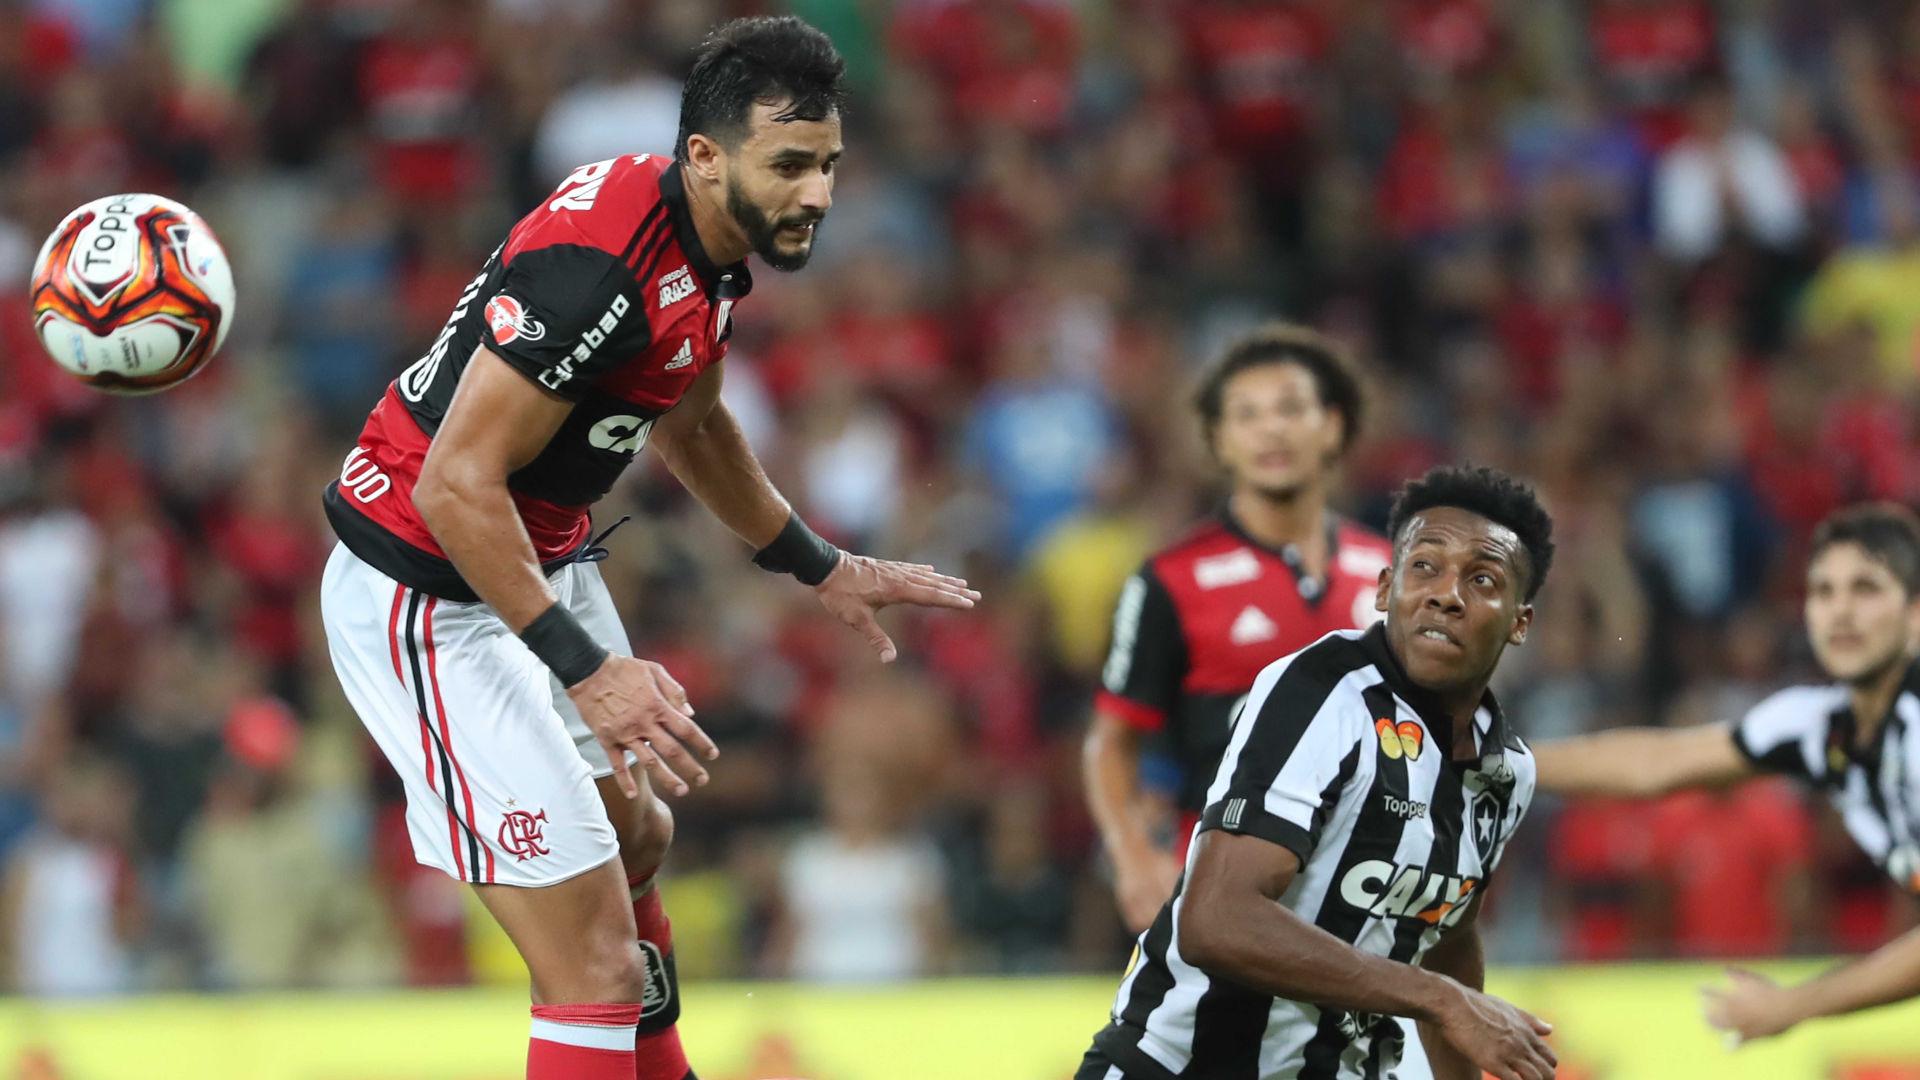 Henrique Dourado Flamengo Botafogo 28032018 Carioca